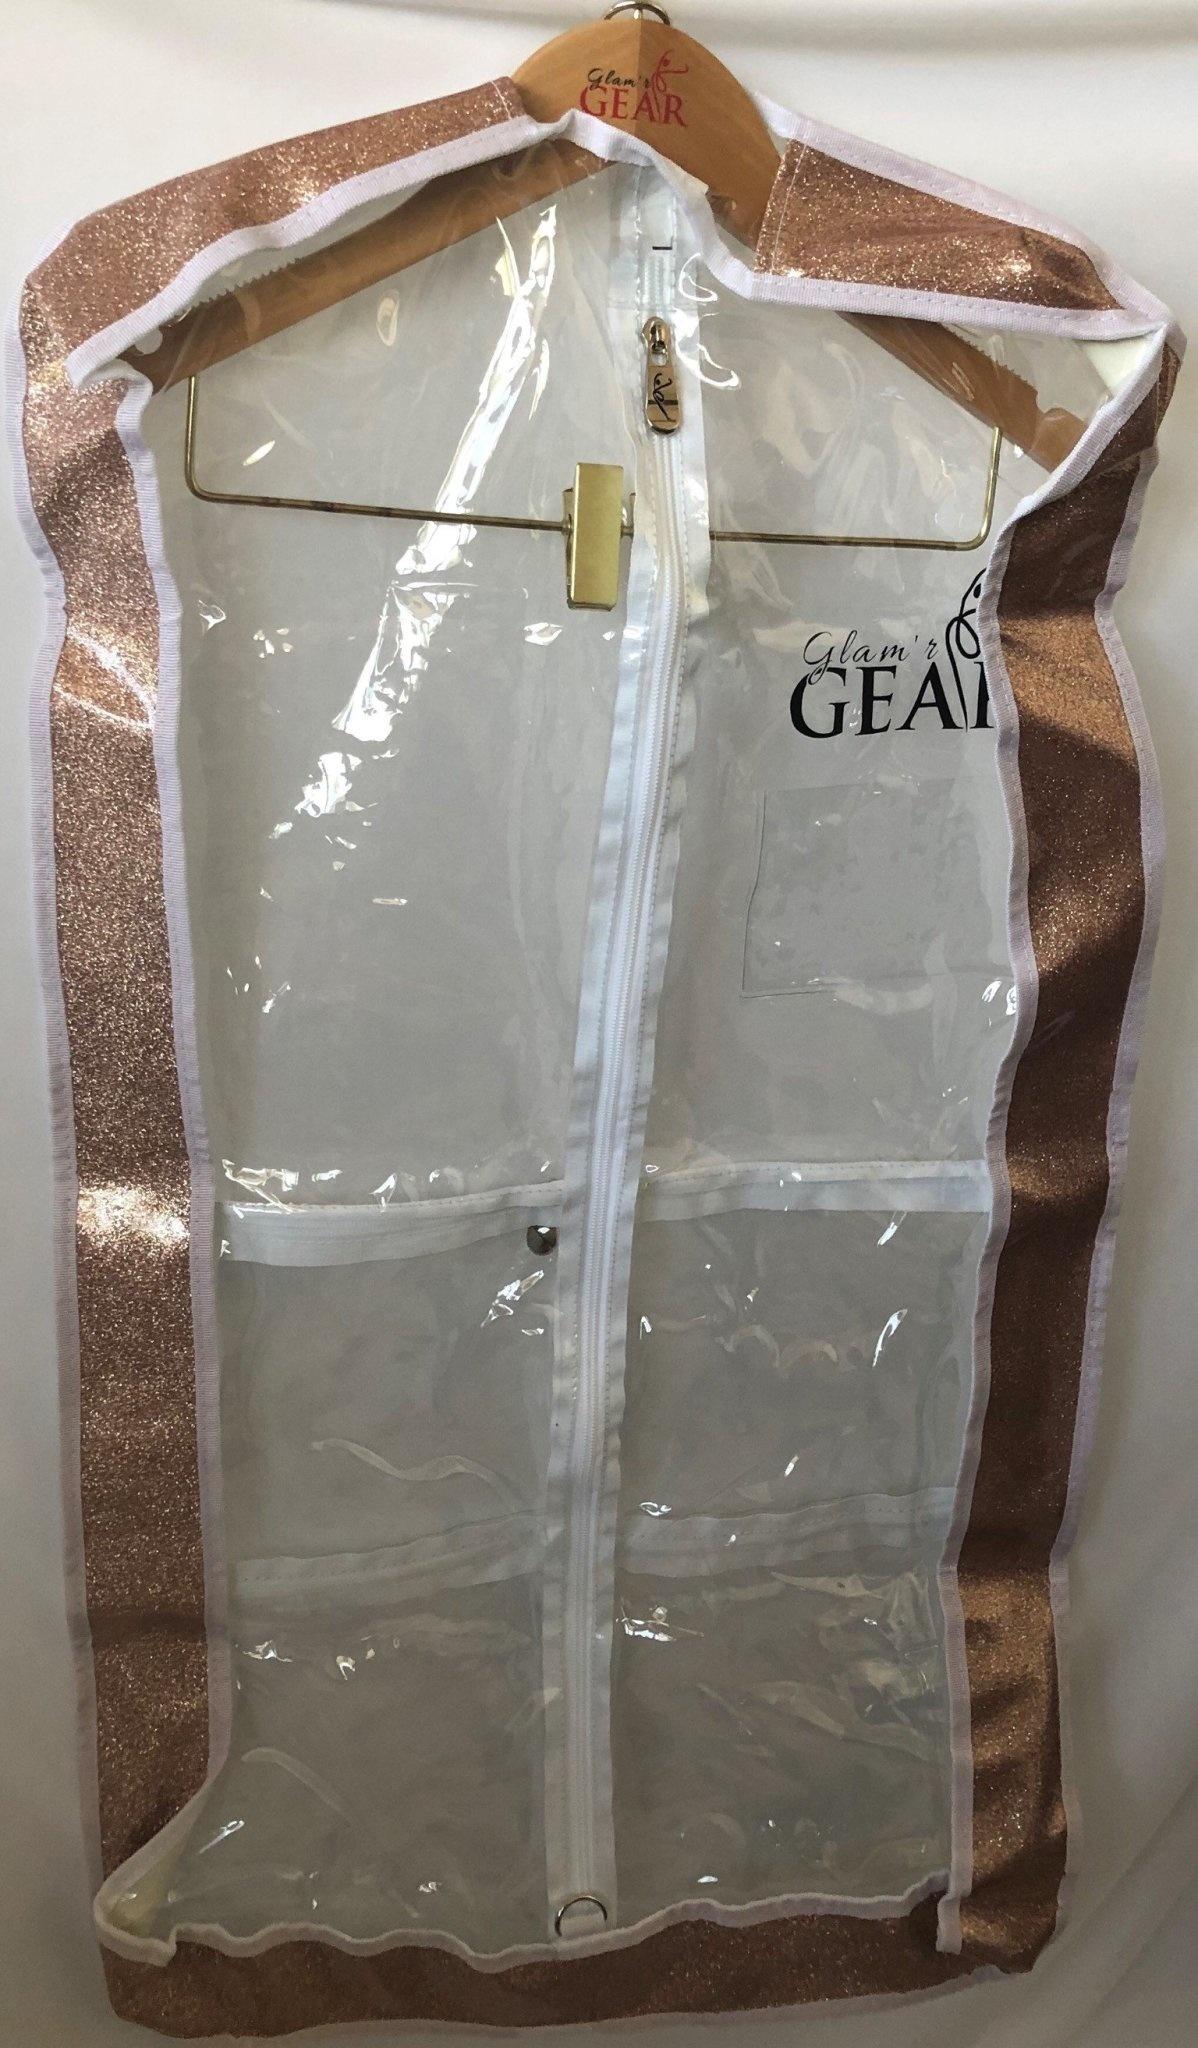 "Glam'r Gear Glam'r Gear Garment Bag, 2"" Gusset, 24"" Long"